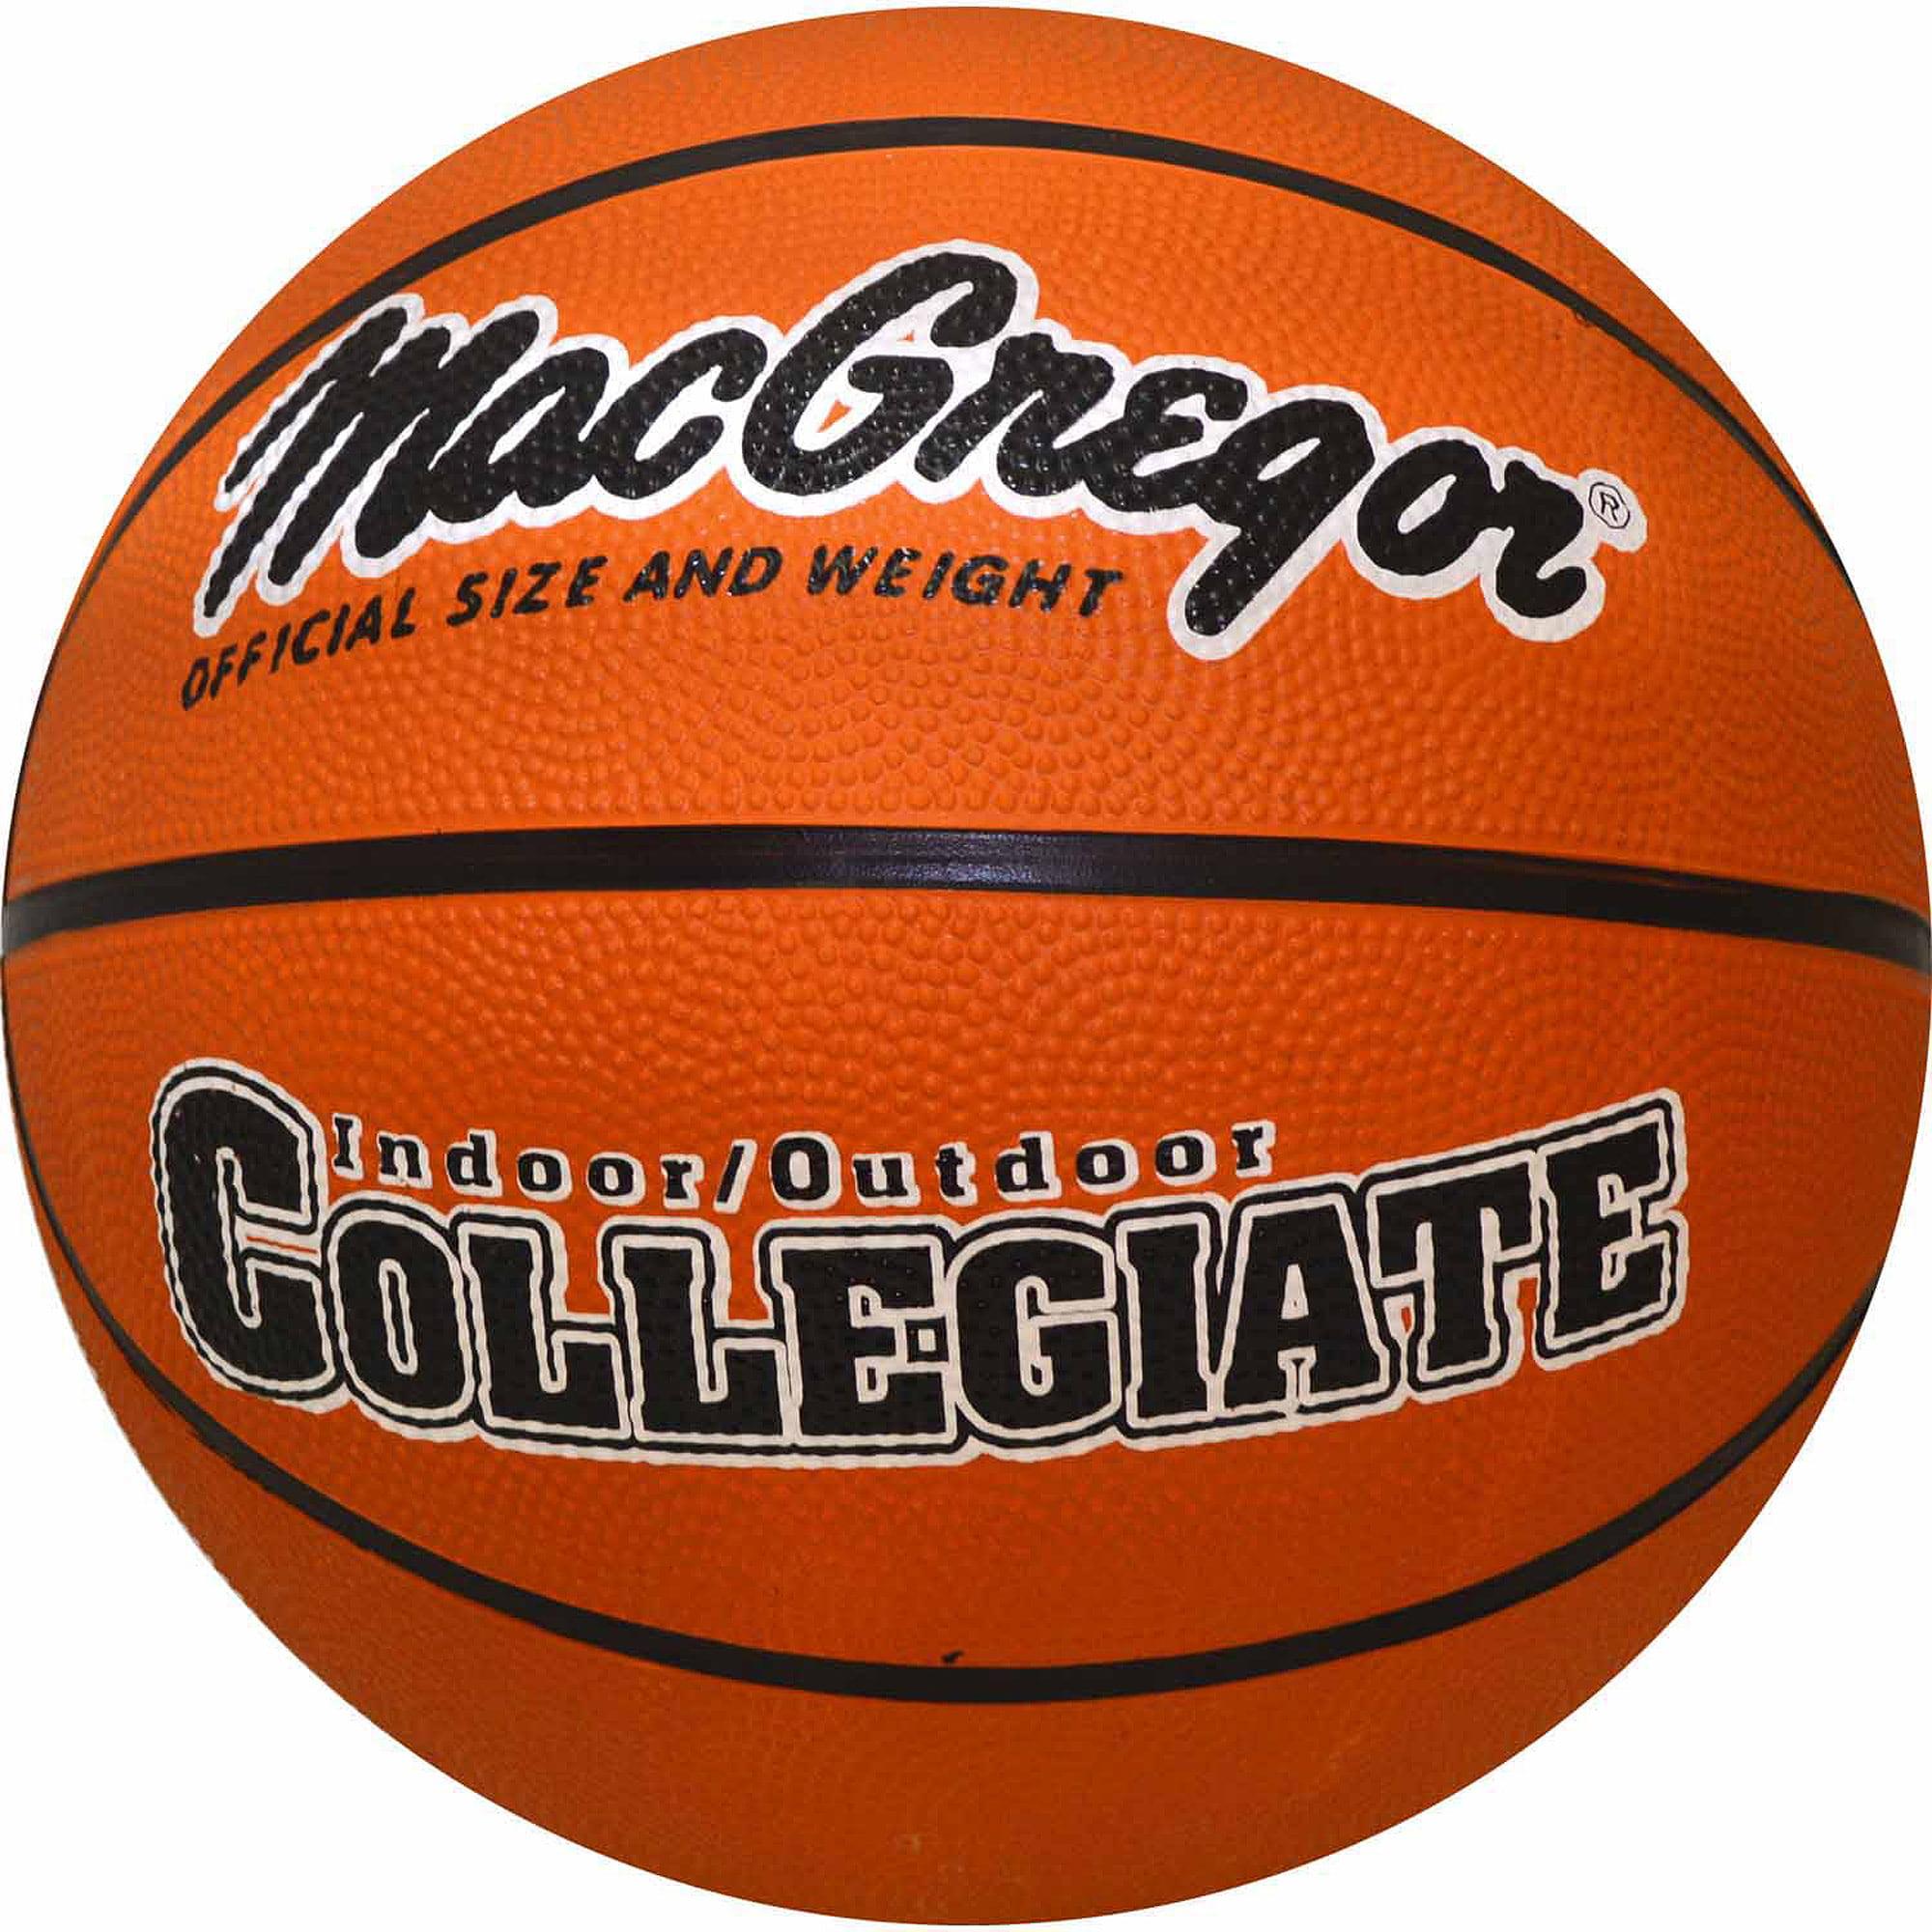 MacGregor Basketball